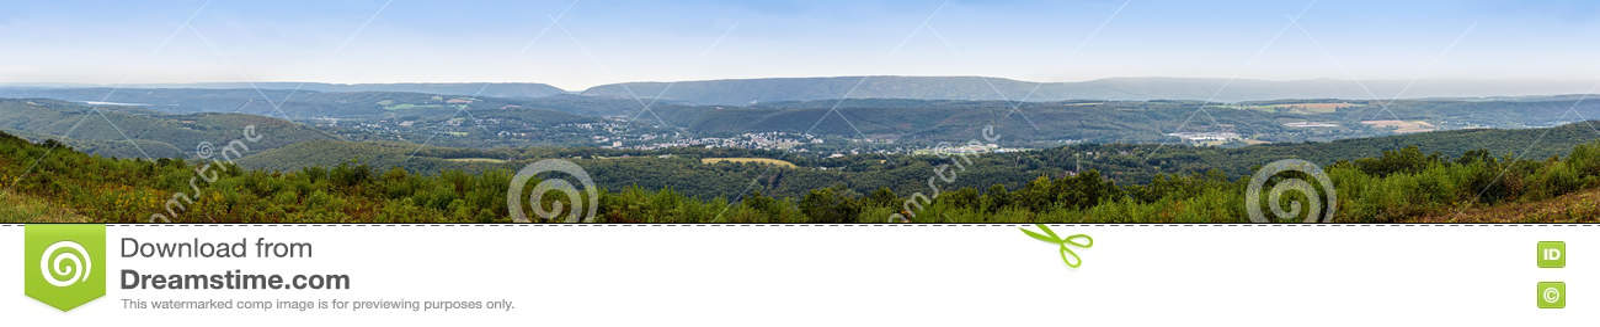 Fahnenmast-Bergpanorama